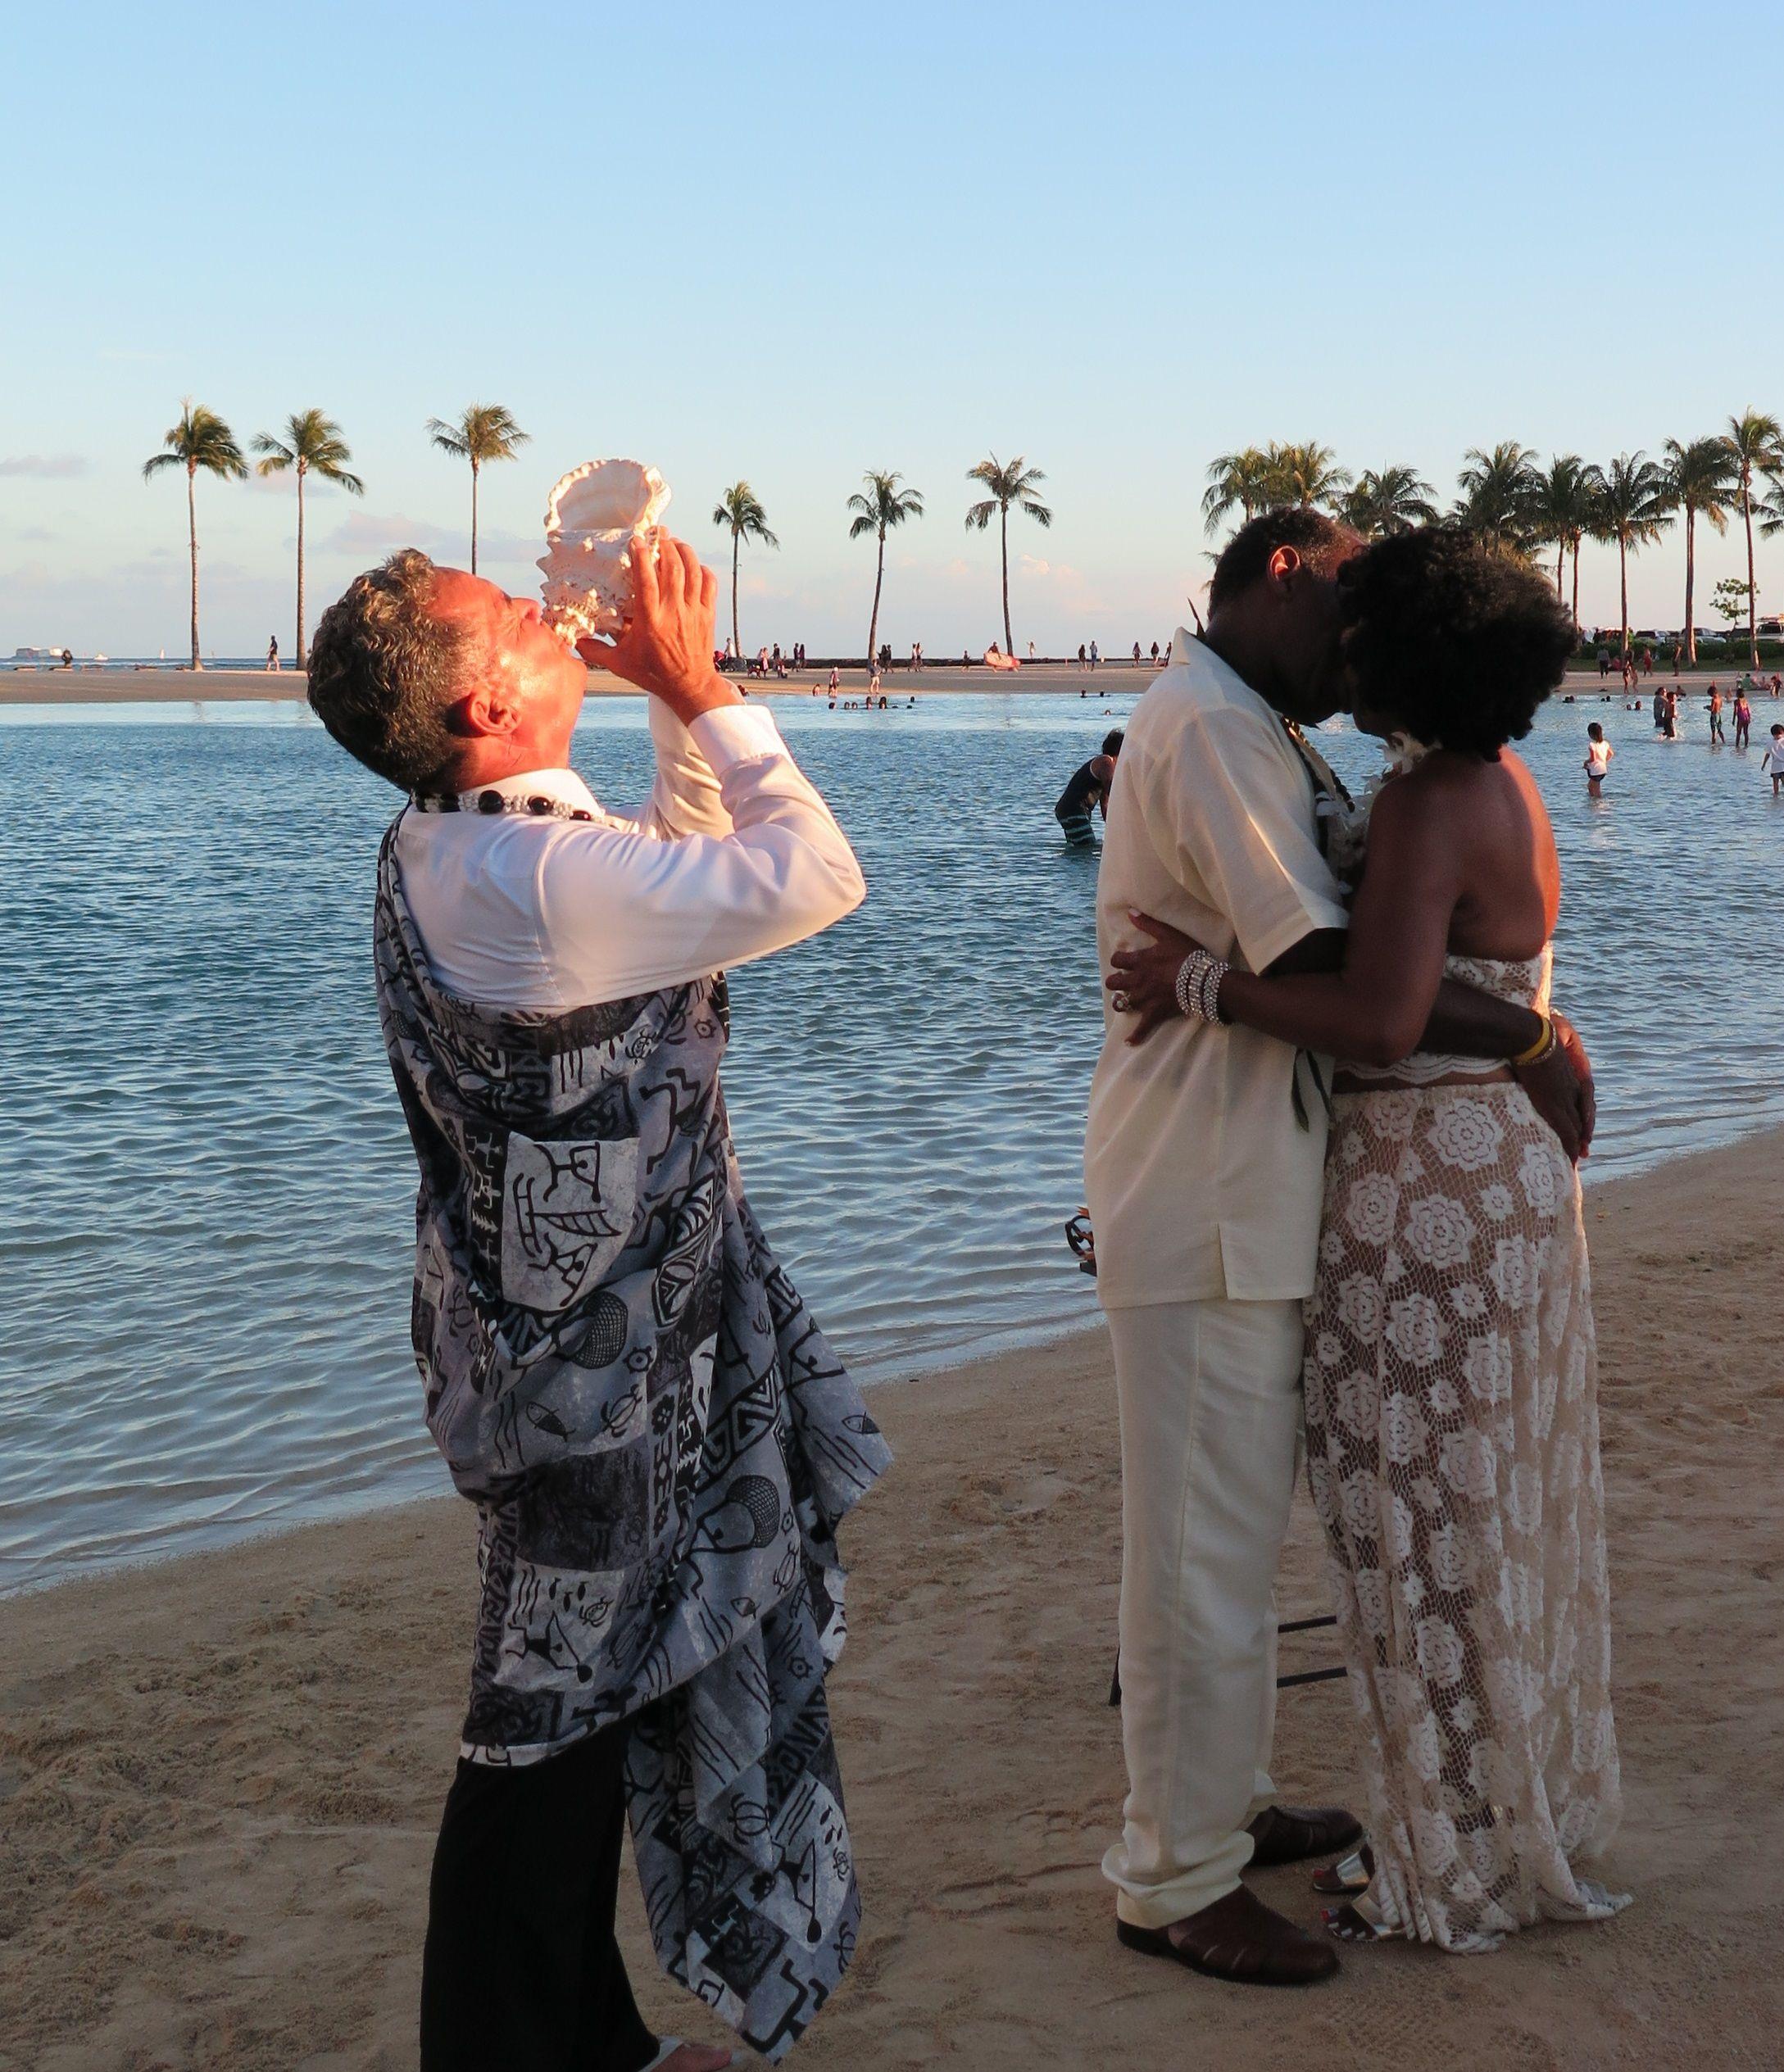 Waikiki Beach Wedding Ceremony: Hawaiian Ceremony Celebrating This 30 Year Vow Renewal In